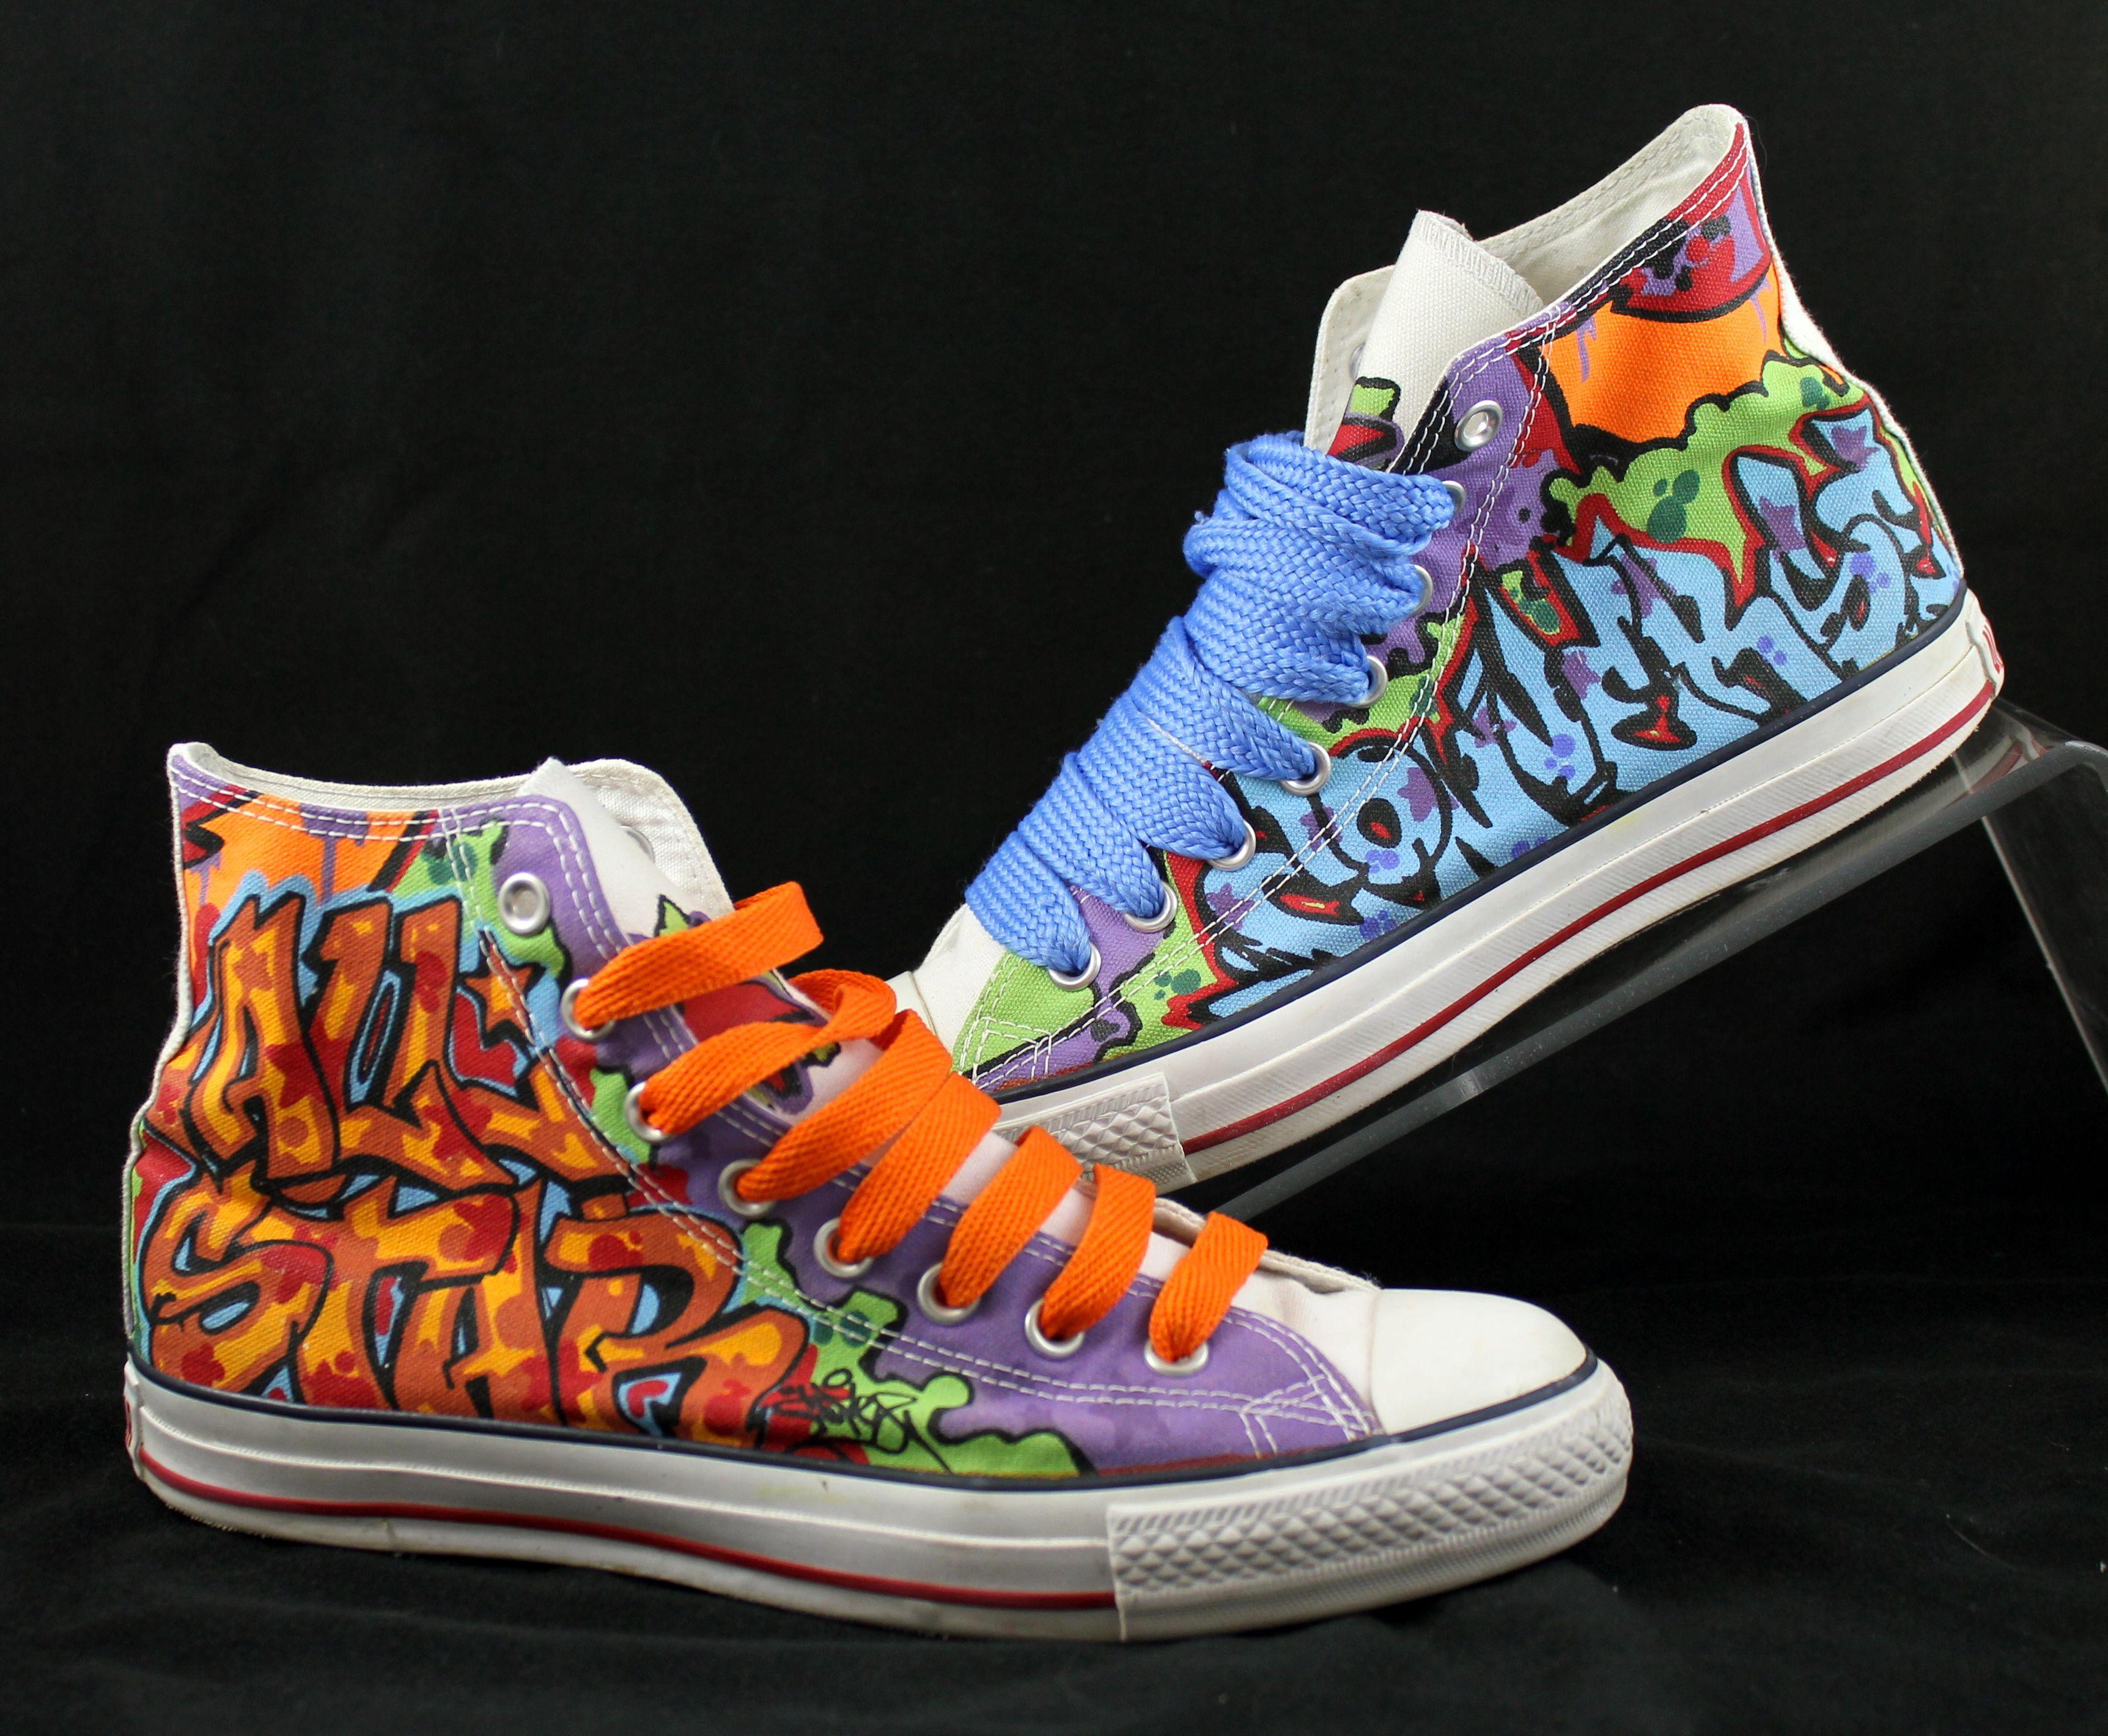 ConverseRandomx ShoesCustom Graffiti ShoesCustom Sneakers Sneakers Graffiti ConverseRandomx bgyfY76